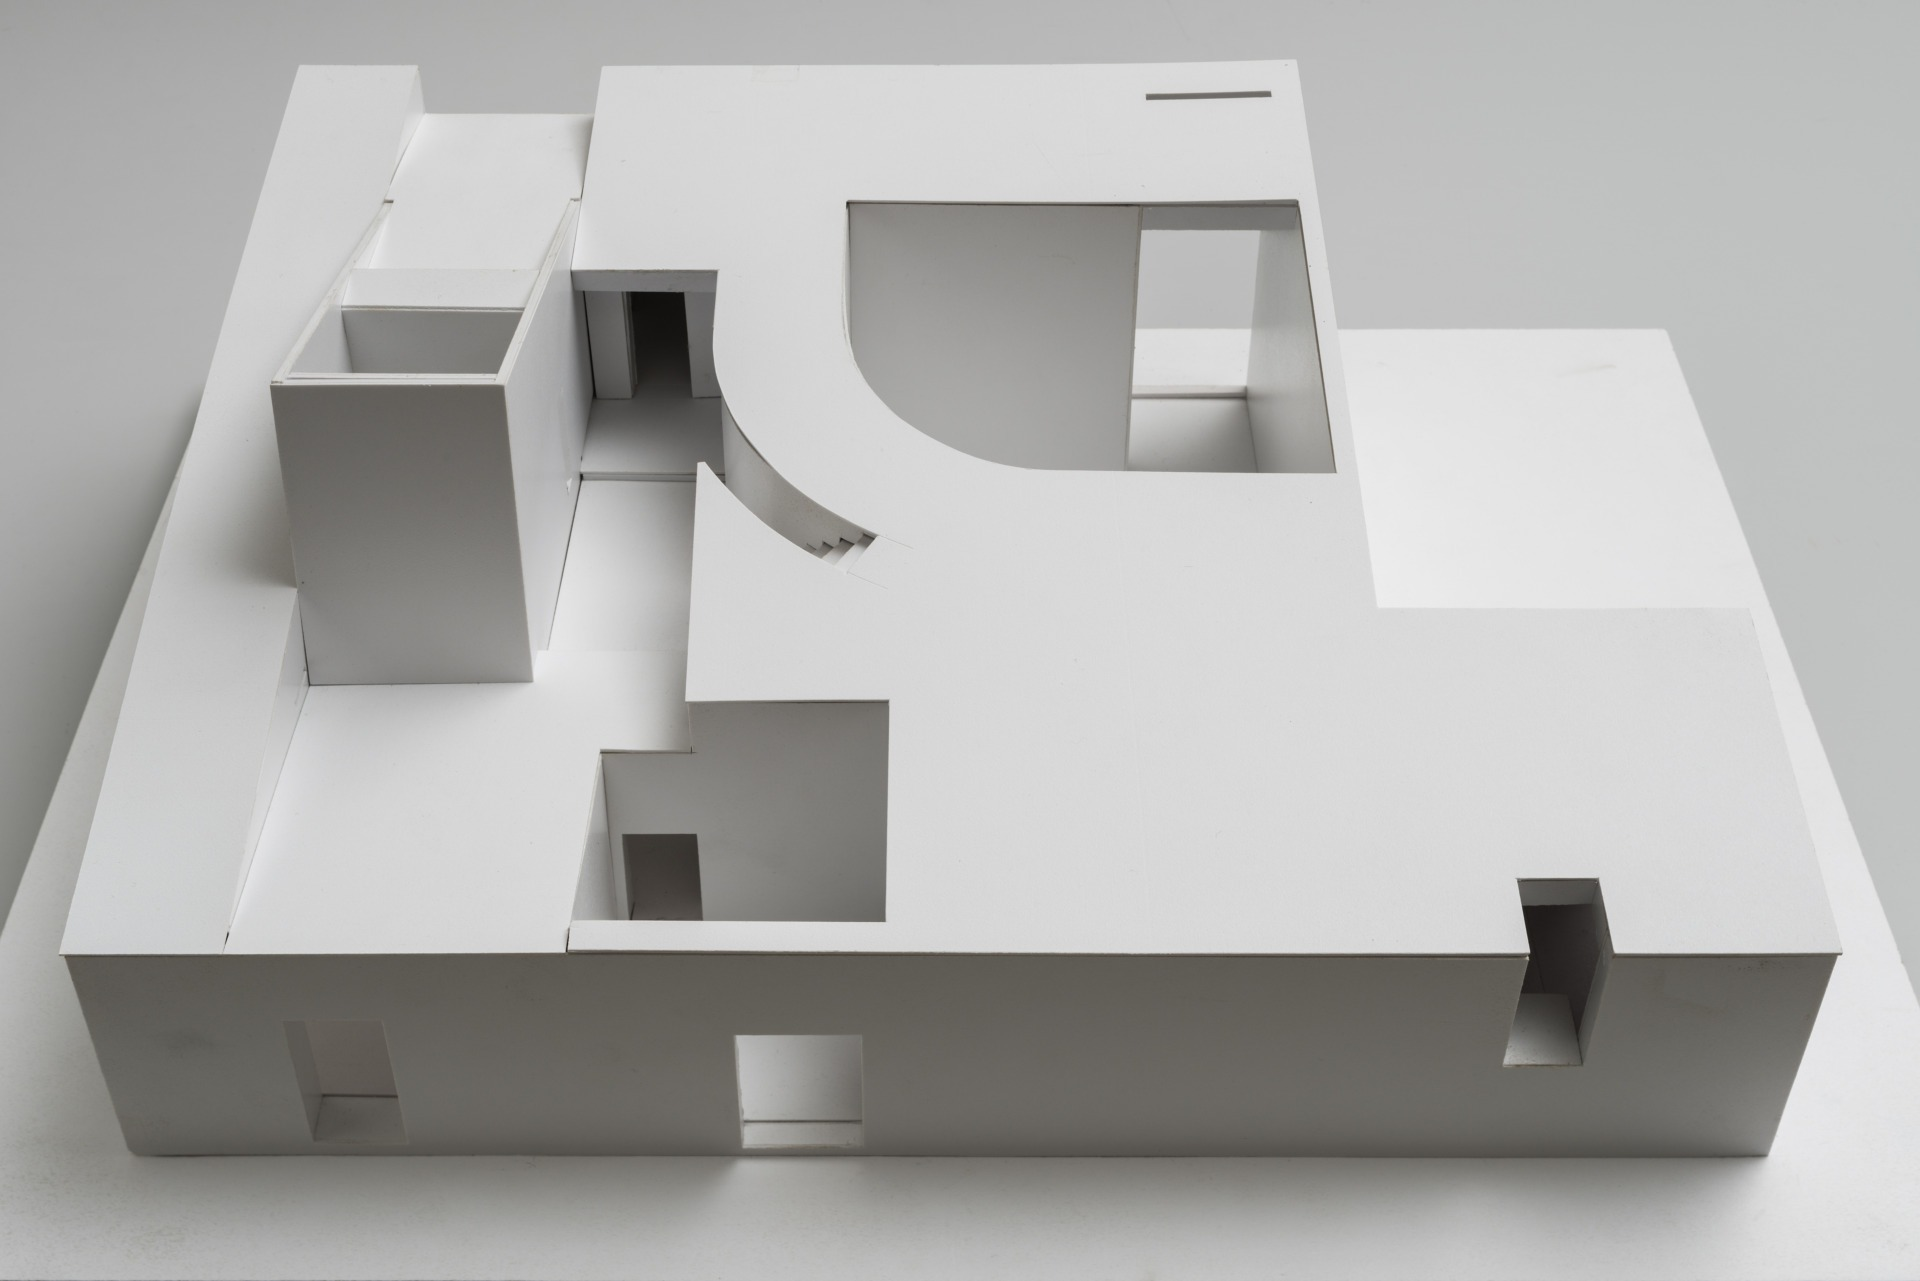 DMF Ressano Garcia Casa Terrac¦oo Modelo 3053